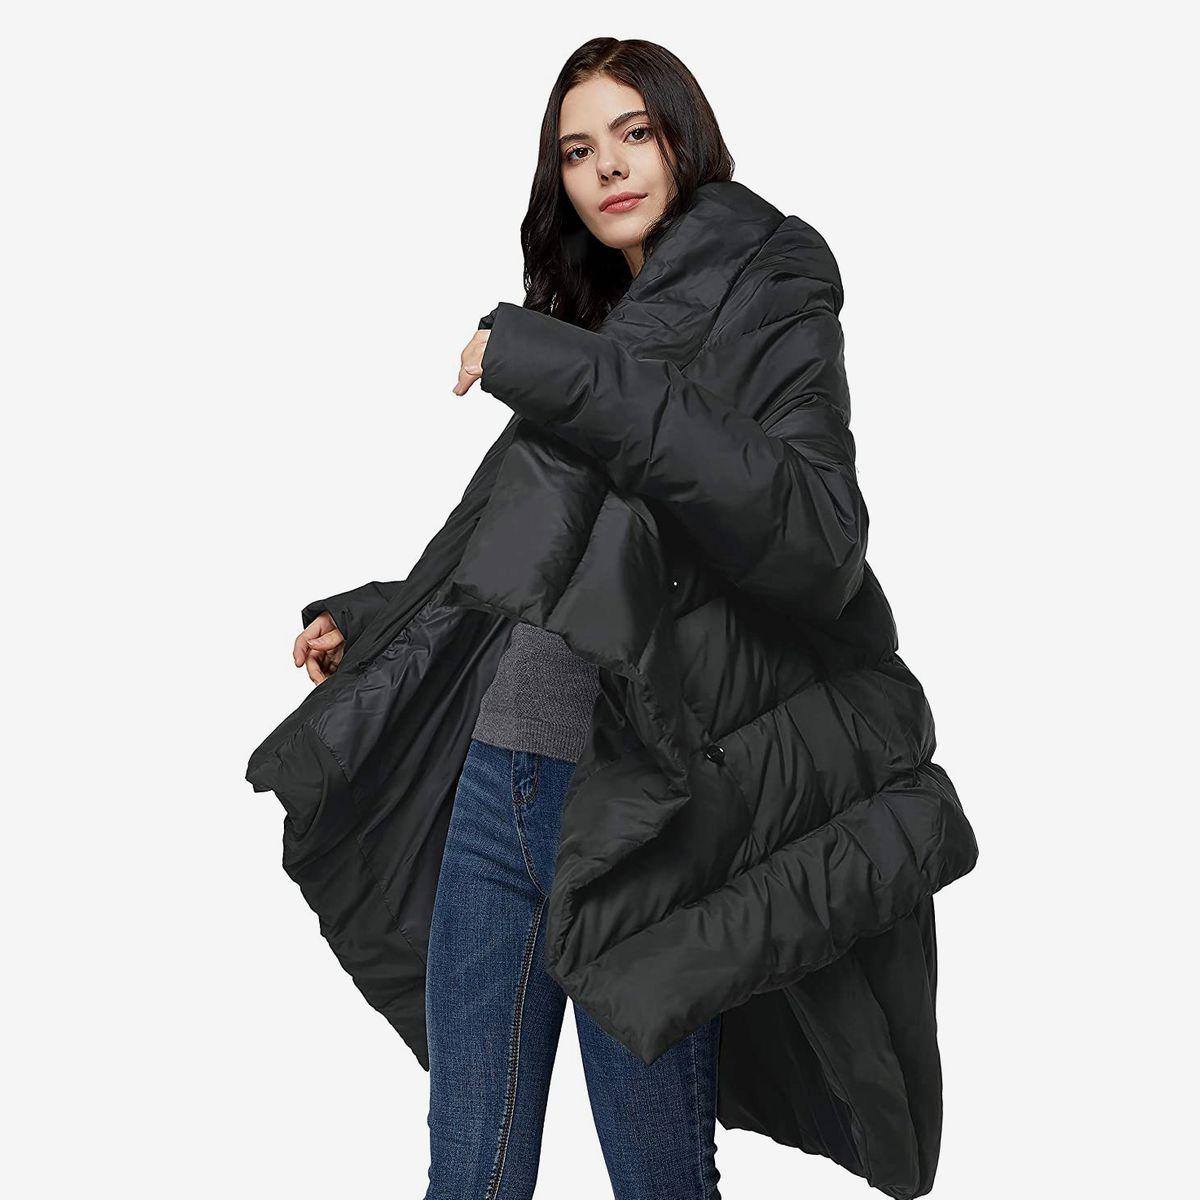 10 Warm and Stylish Coats from Amazon